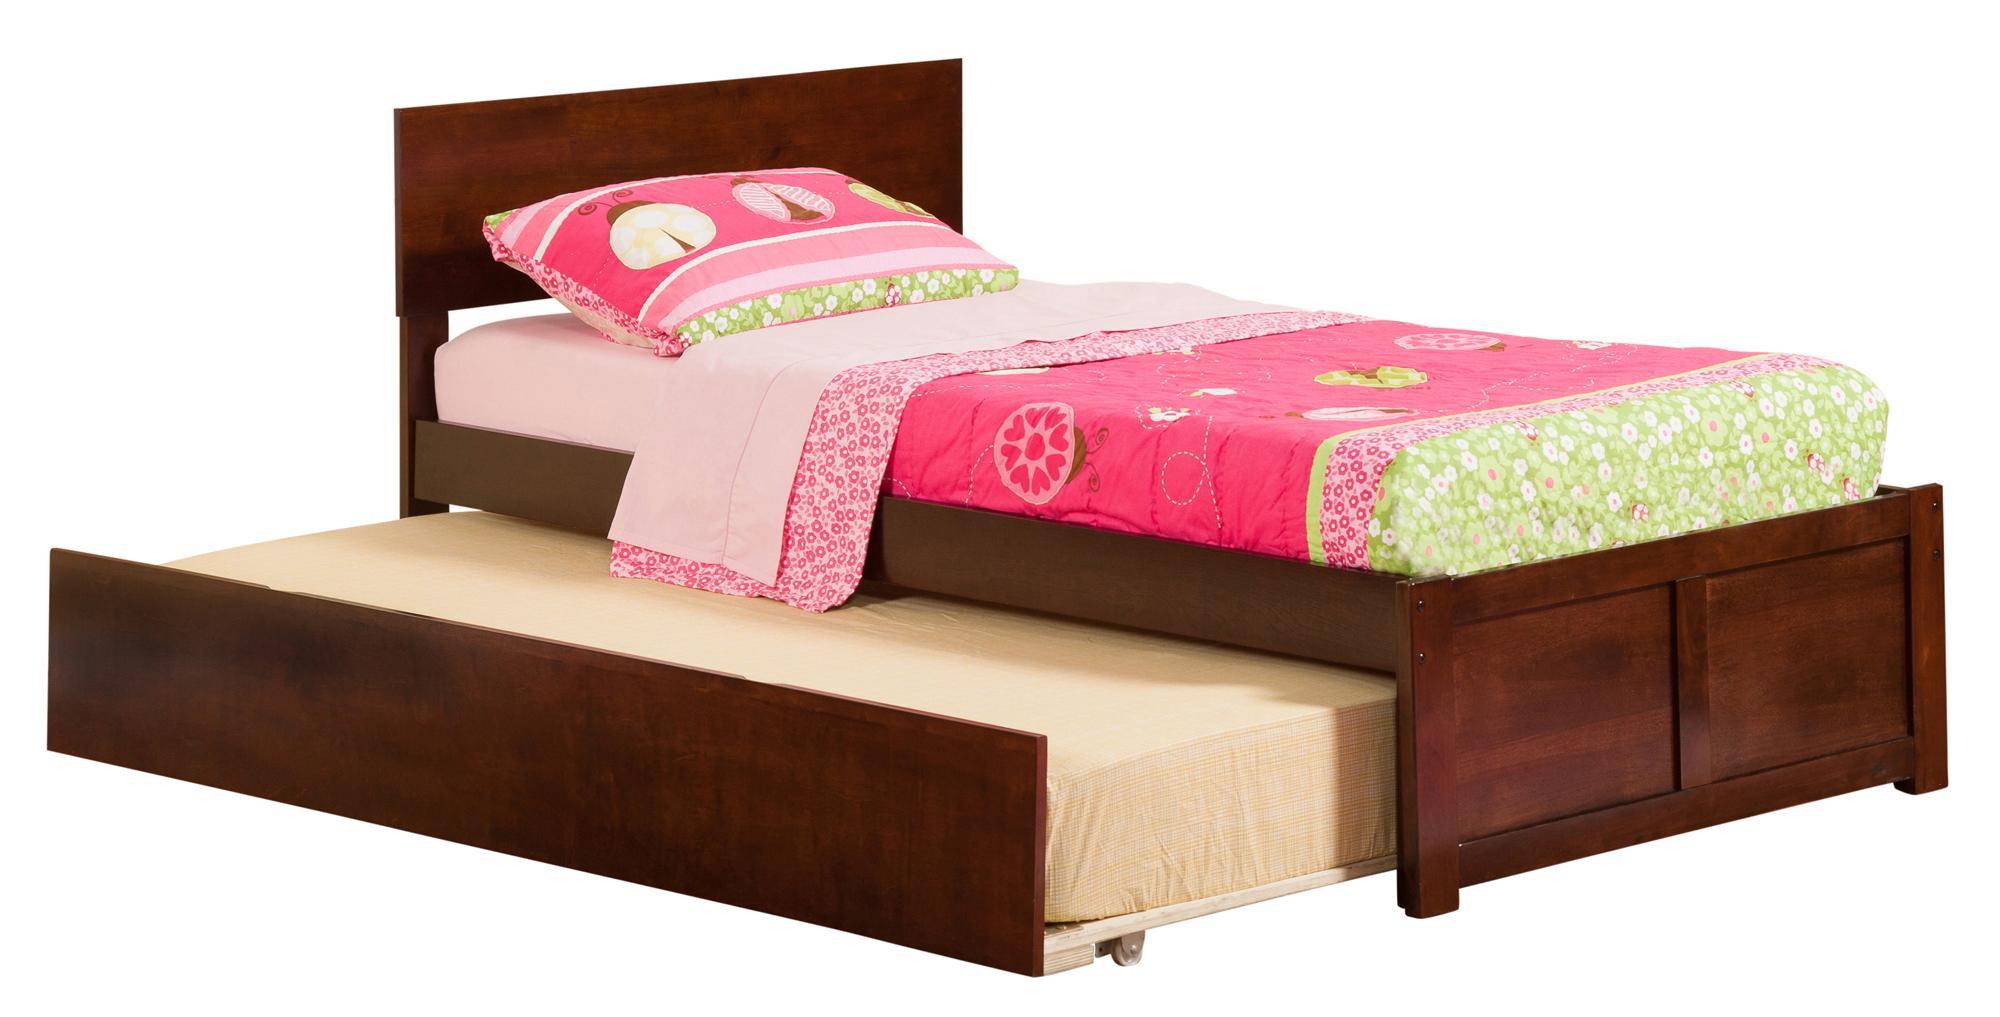 Orlando Furniture W